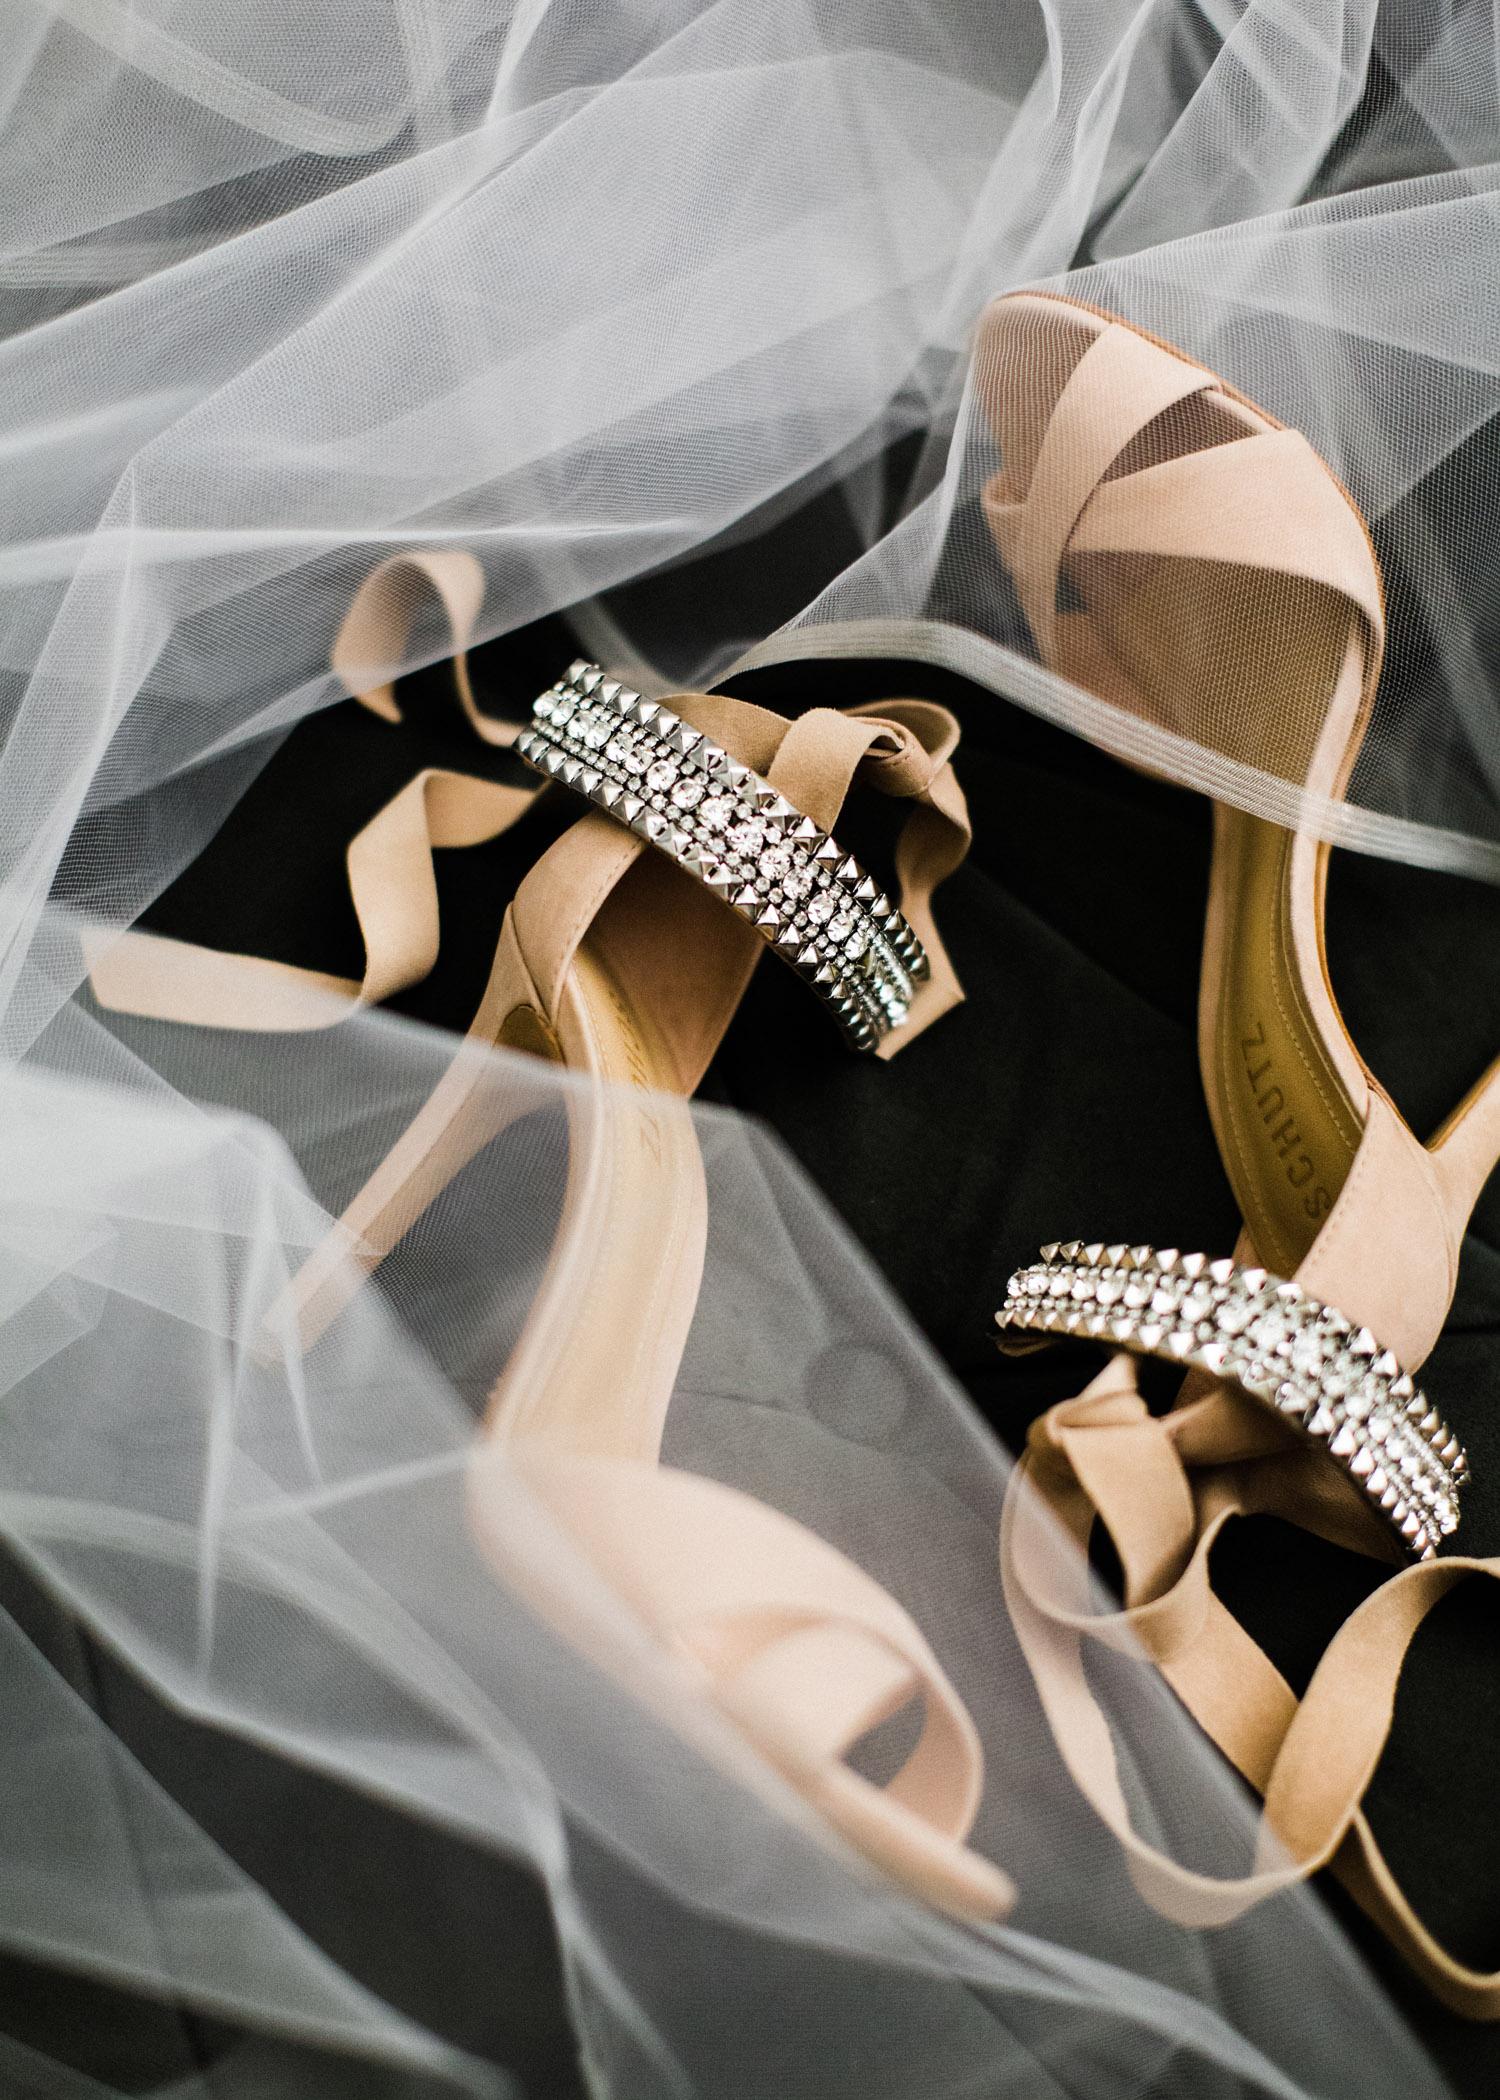 Seattle Wedding Photography Schutz Bridal Shoes.jpg